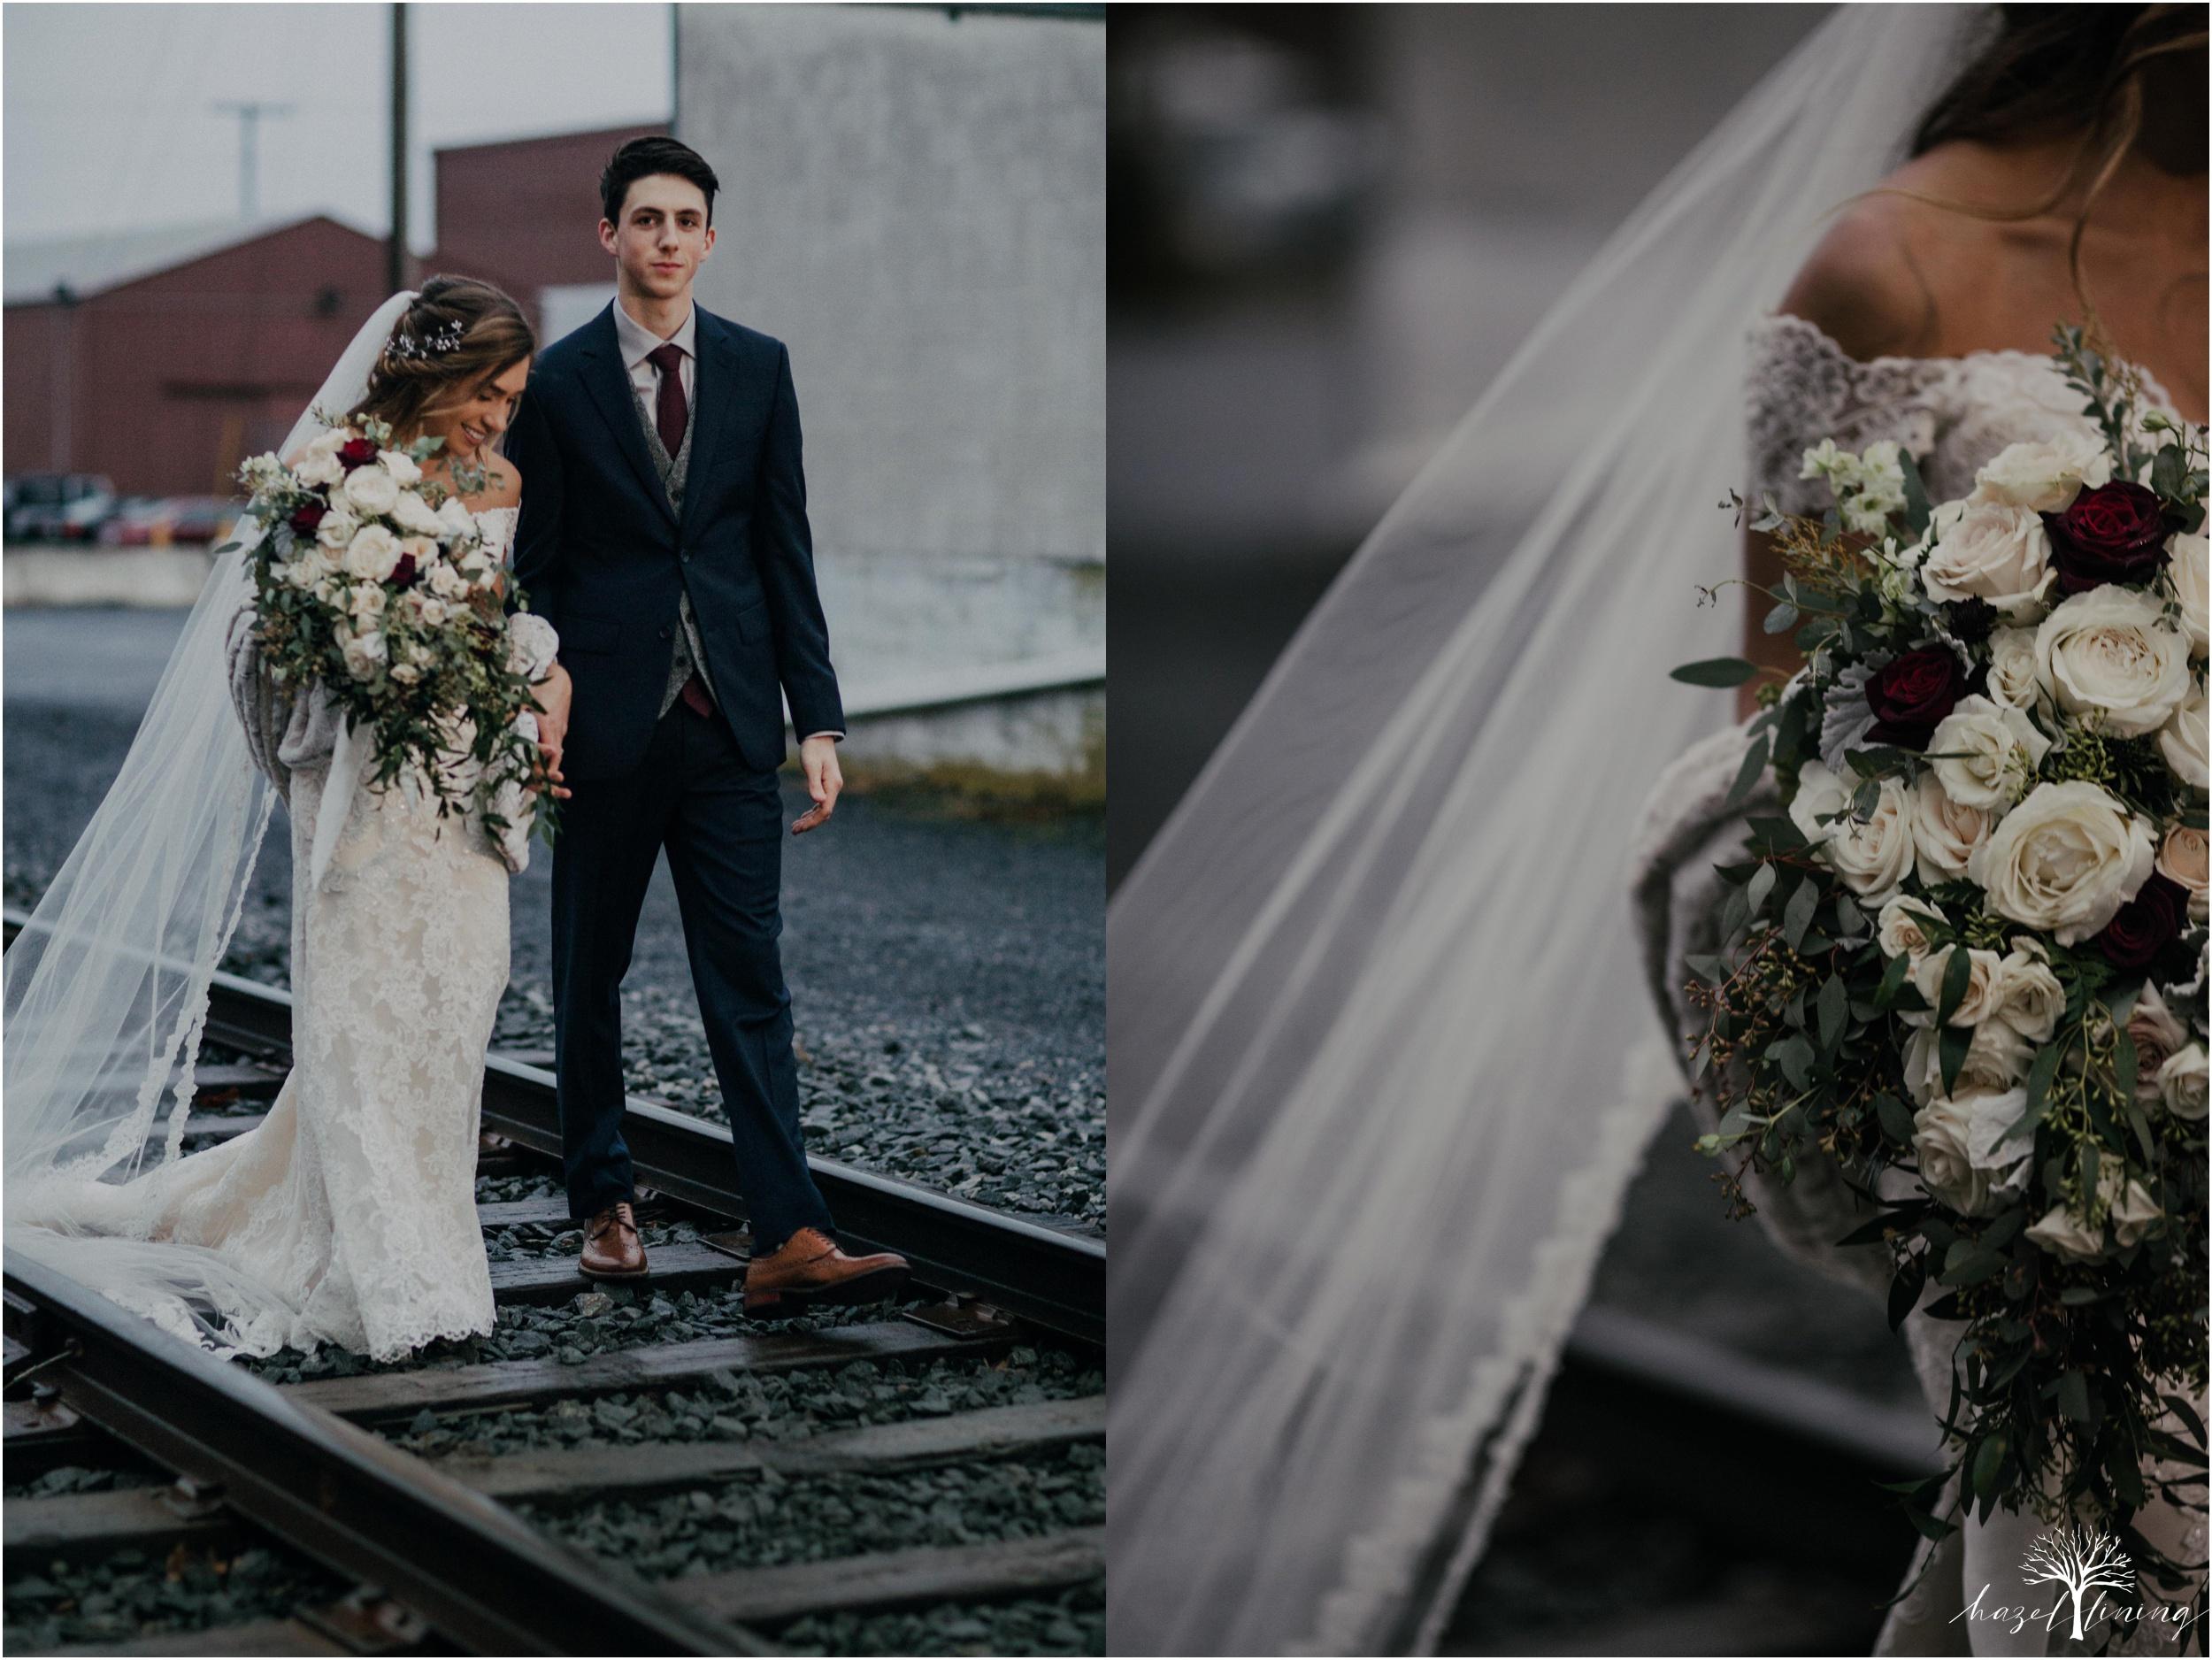 emma-matt-gehringer-the-booking-house-lancaster-manhiem-pennsylvania-winter-wedding_0101.jpg